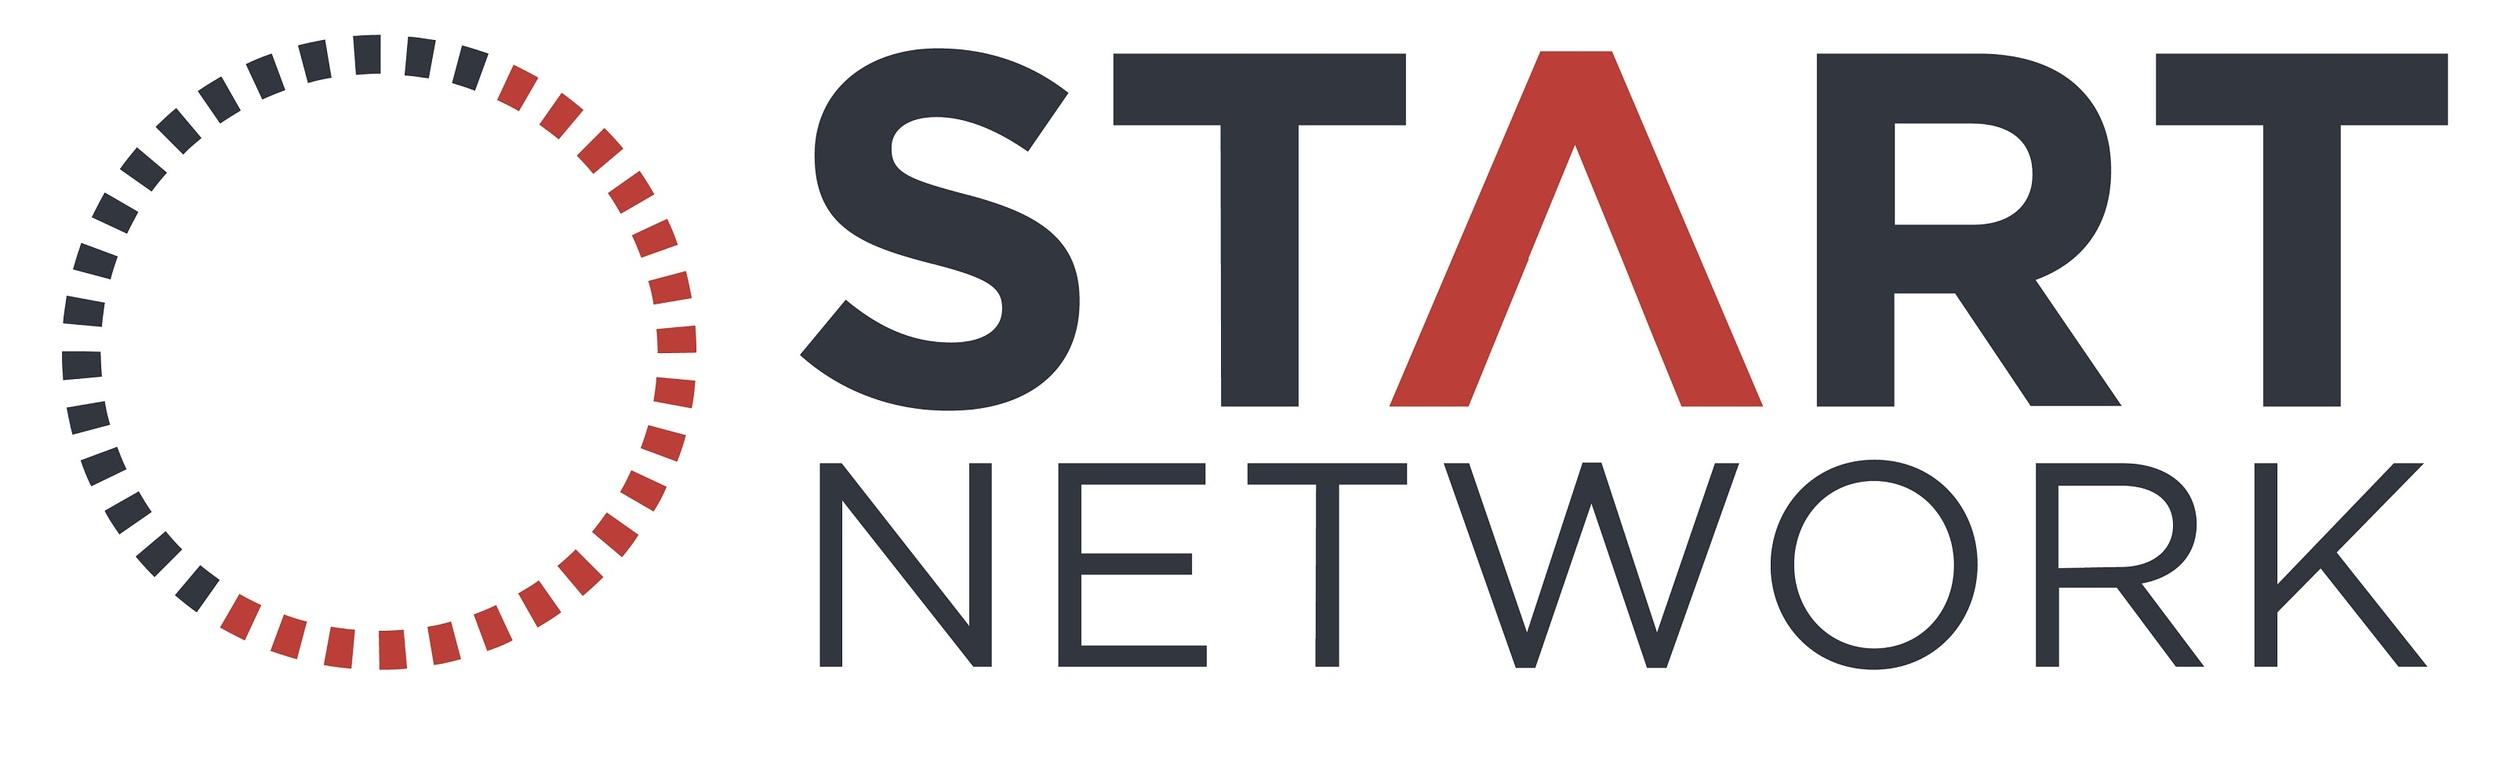 Start Network logo big.jpg